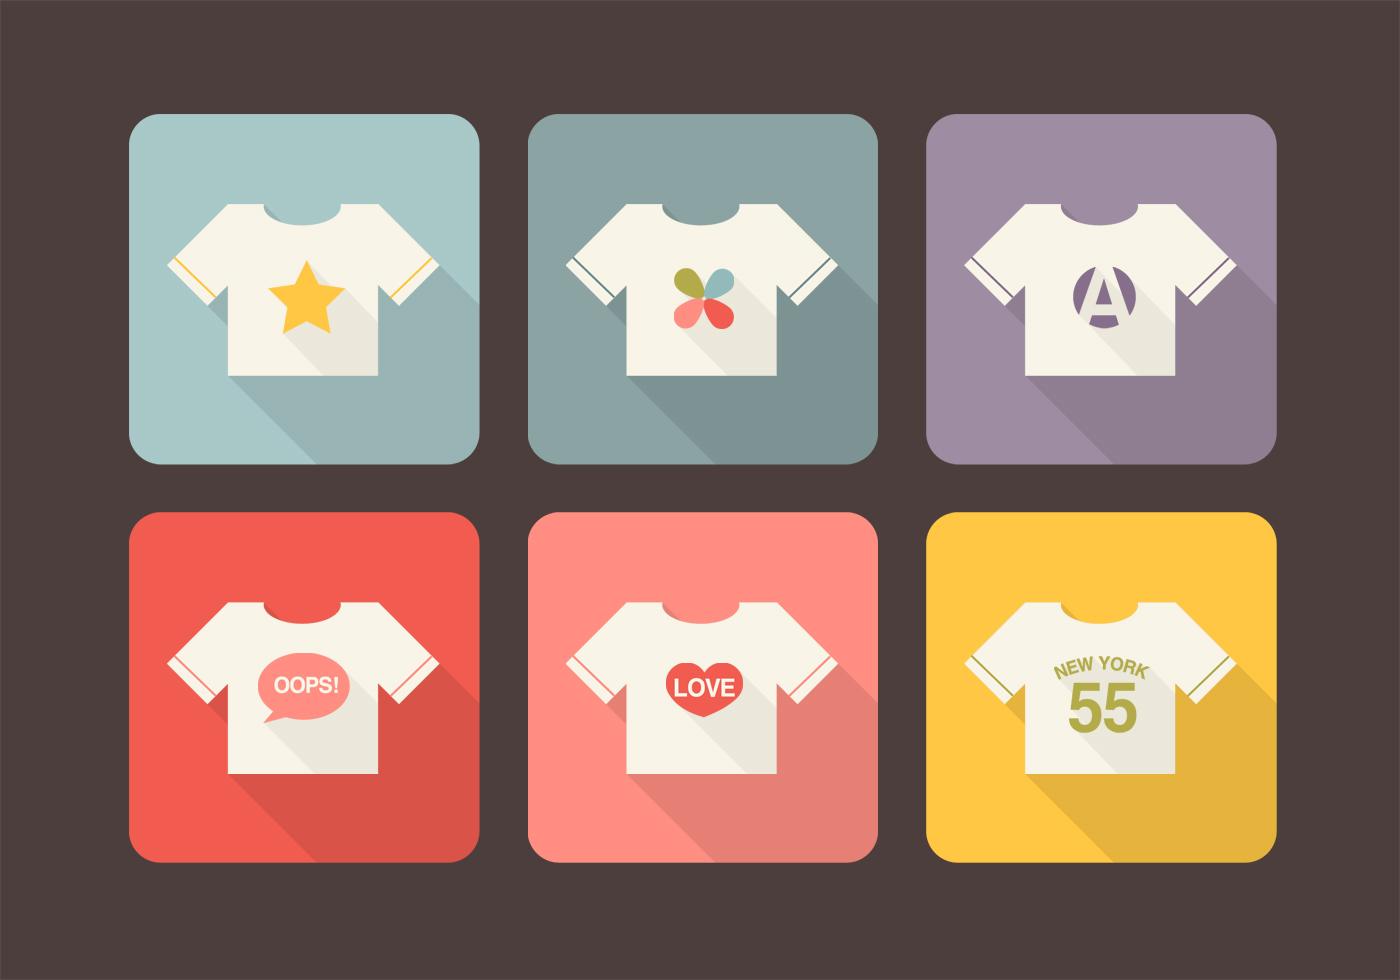 T-Shirt Design Lange Schatten Icons Vector Pack - Kostenlose Vektor ...